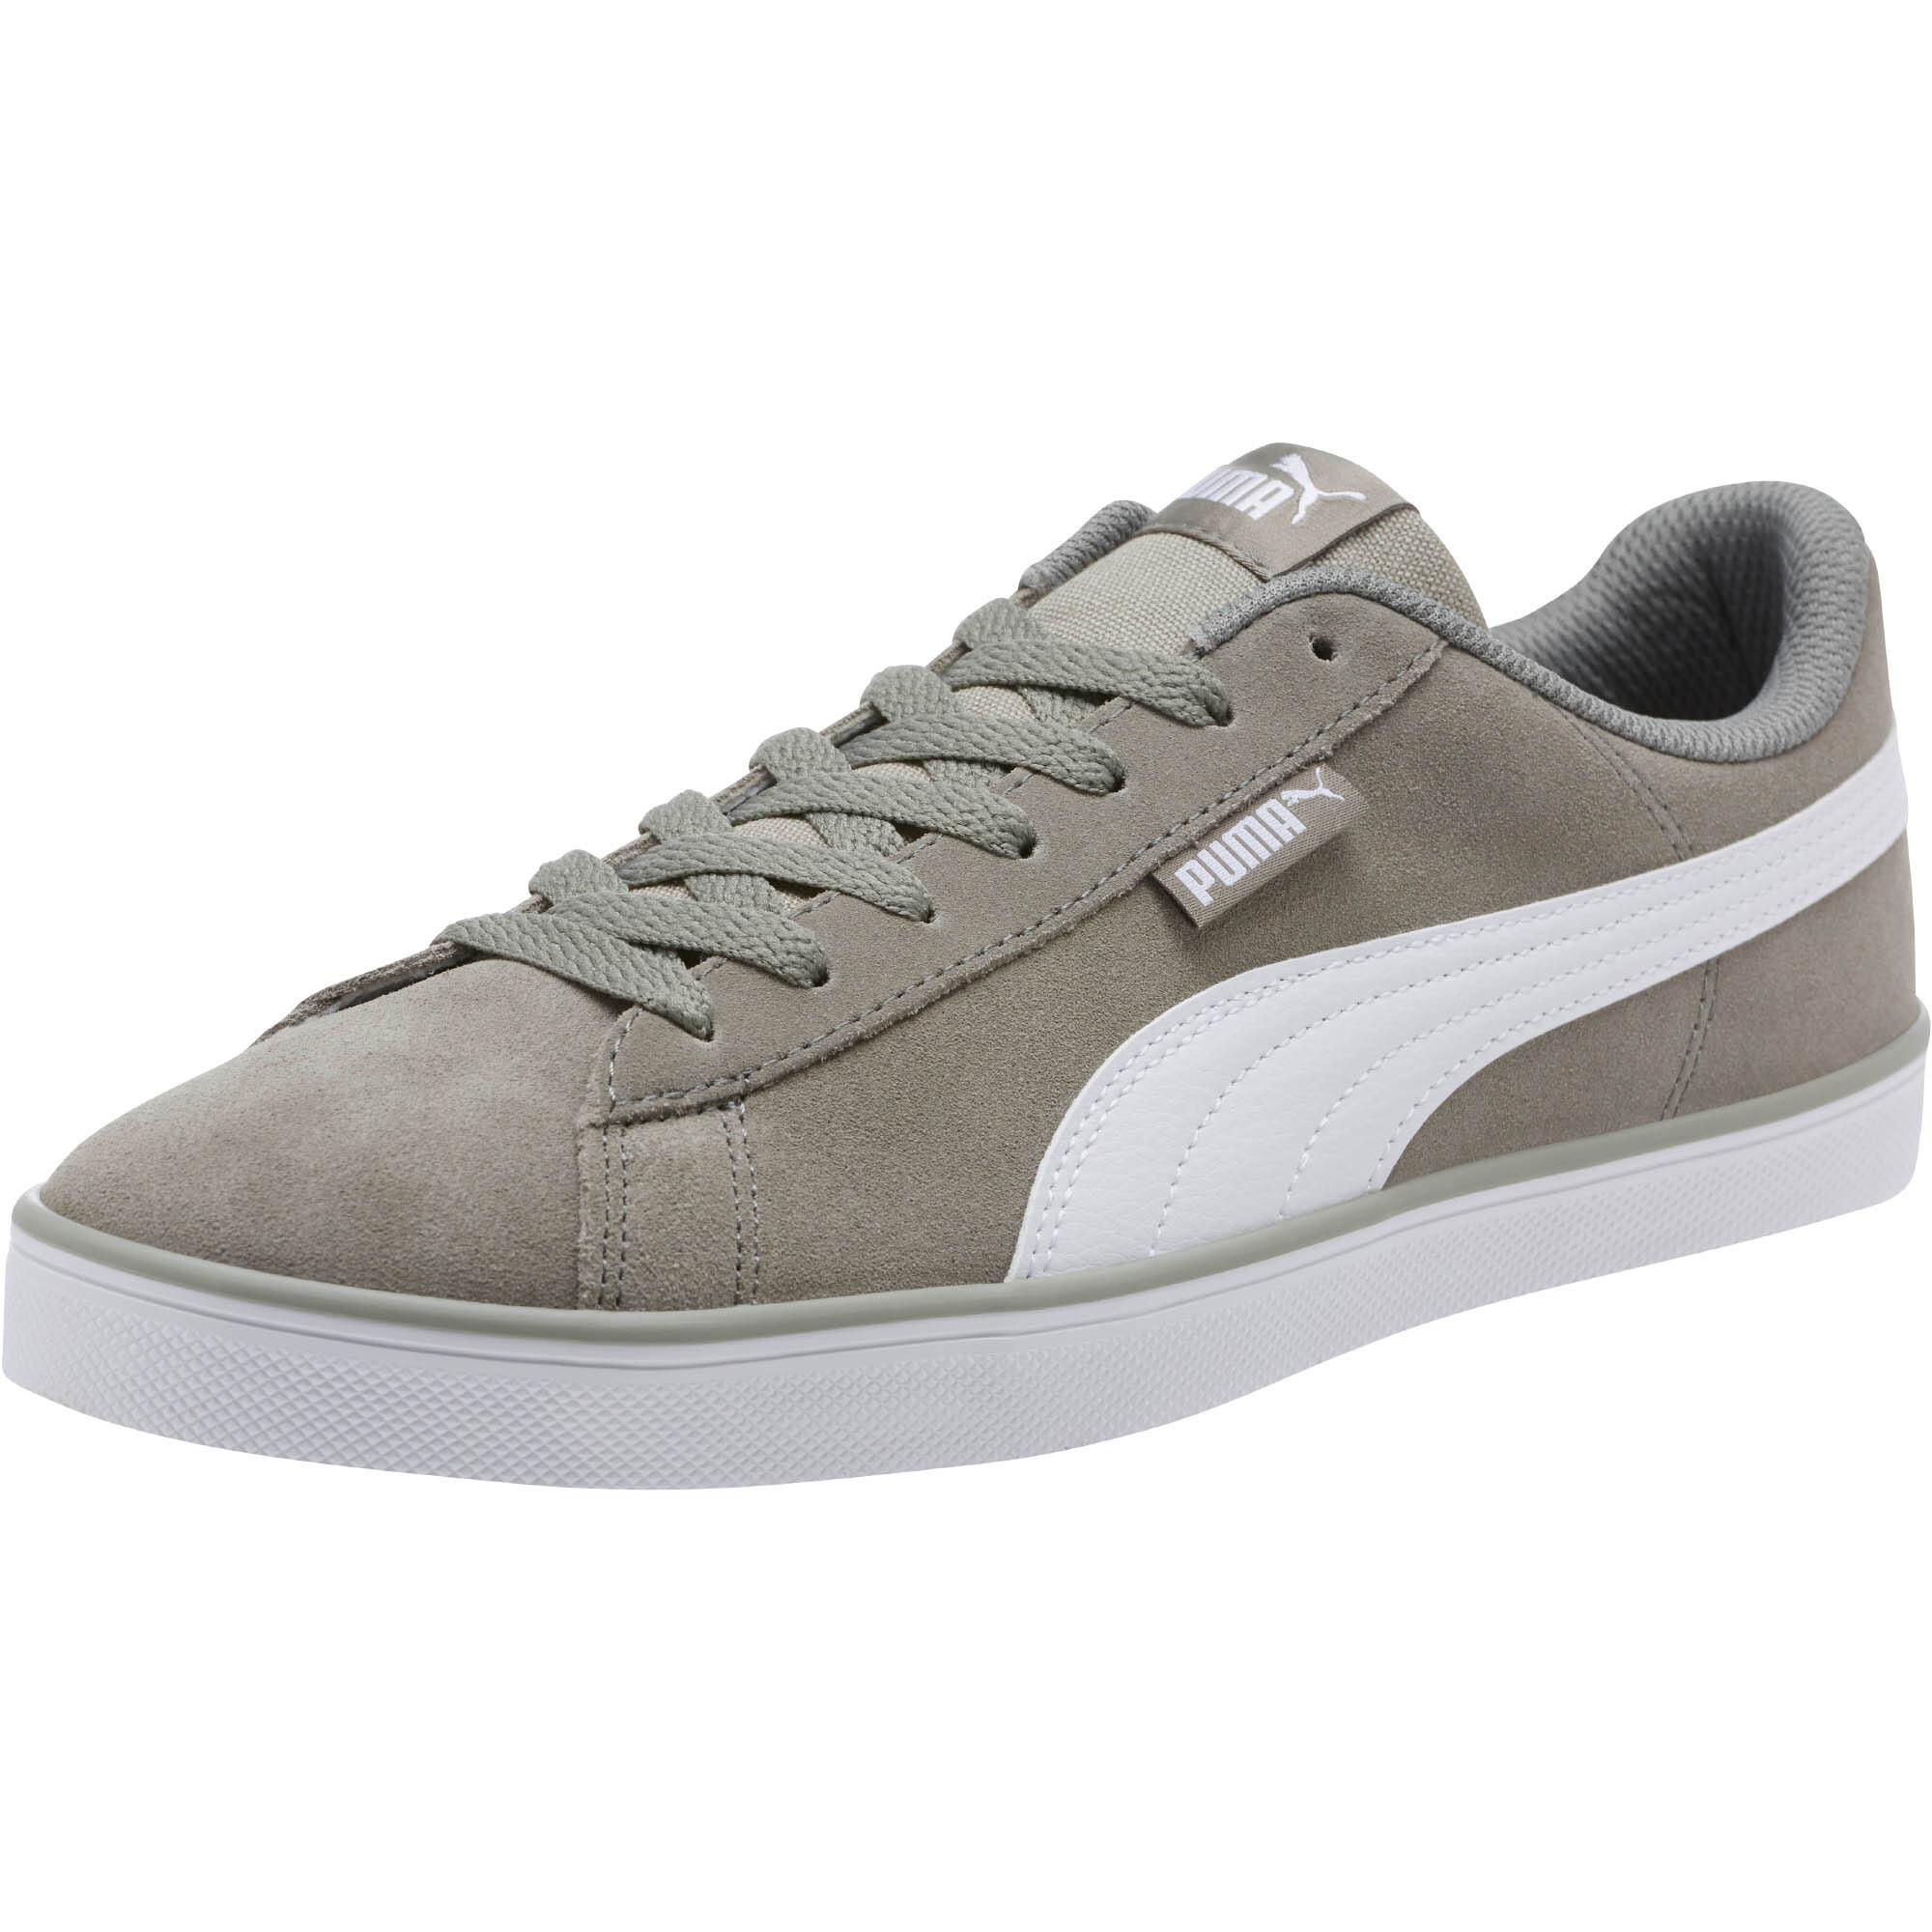 PUMA-Urban-Plus-Suede-Sneakers-Men-Shoe-Basics thumbnail 13